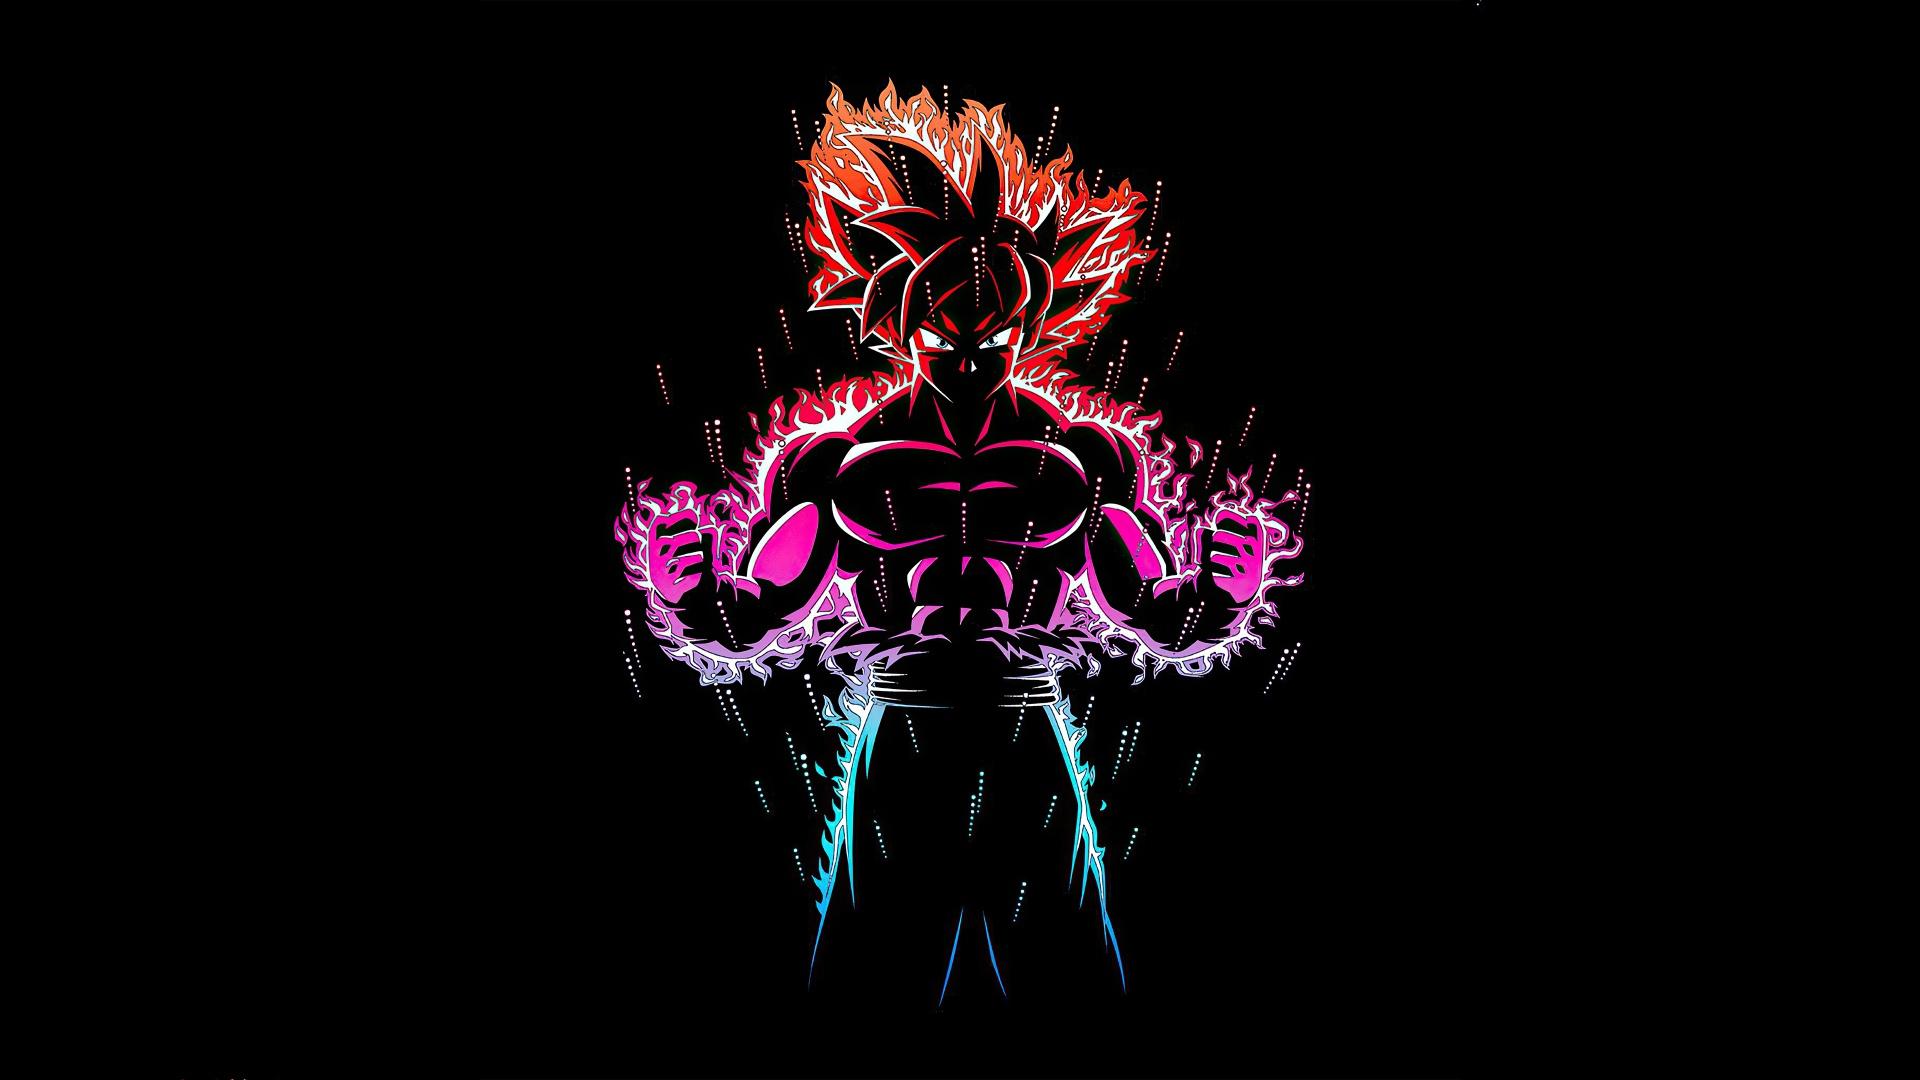 Ultra Instinct Goku 4k Wallpaper Black Background Dragon Ball Z Amoled Graphics Cgi 1817